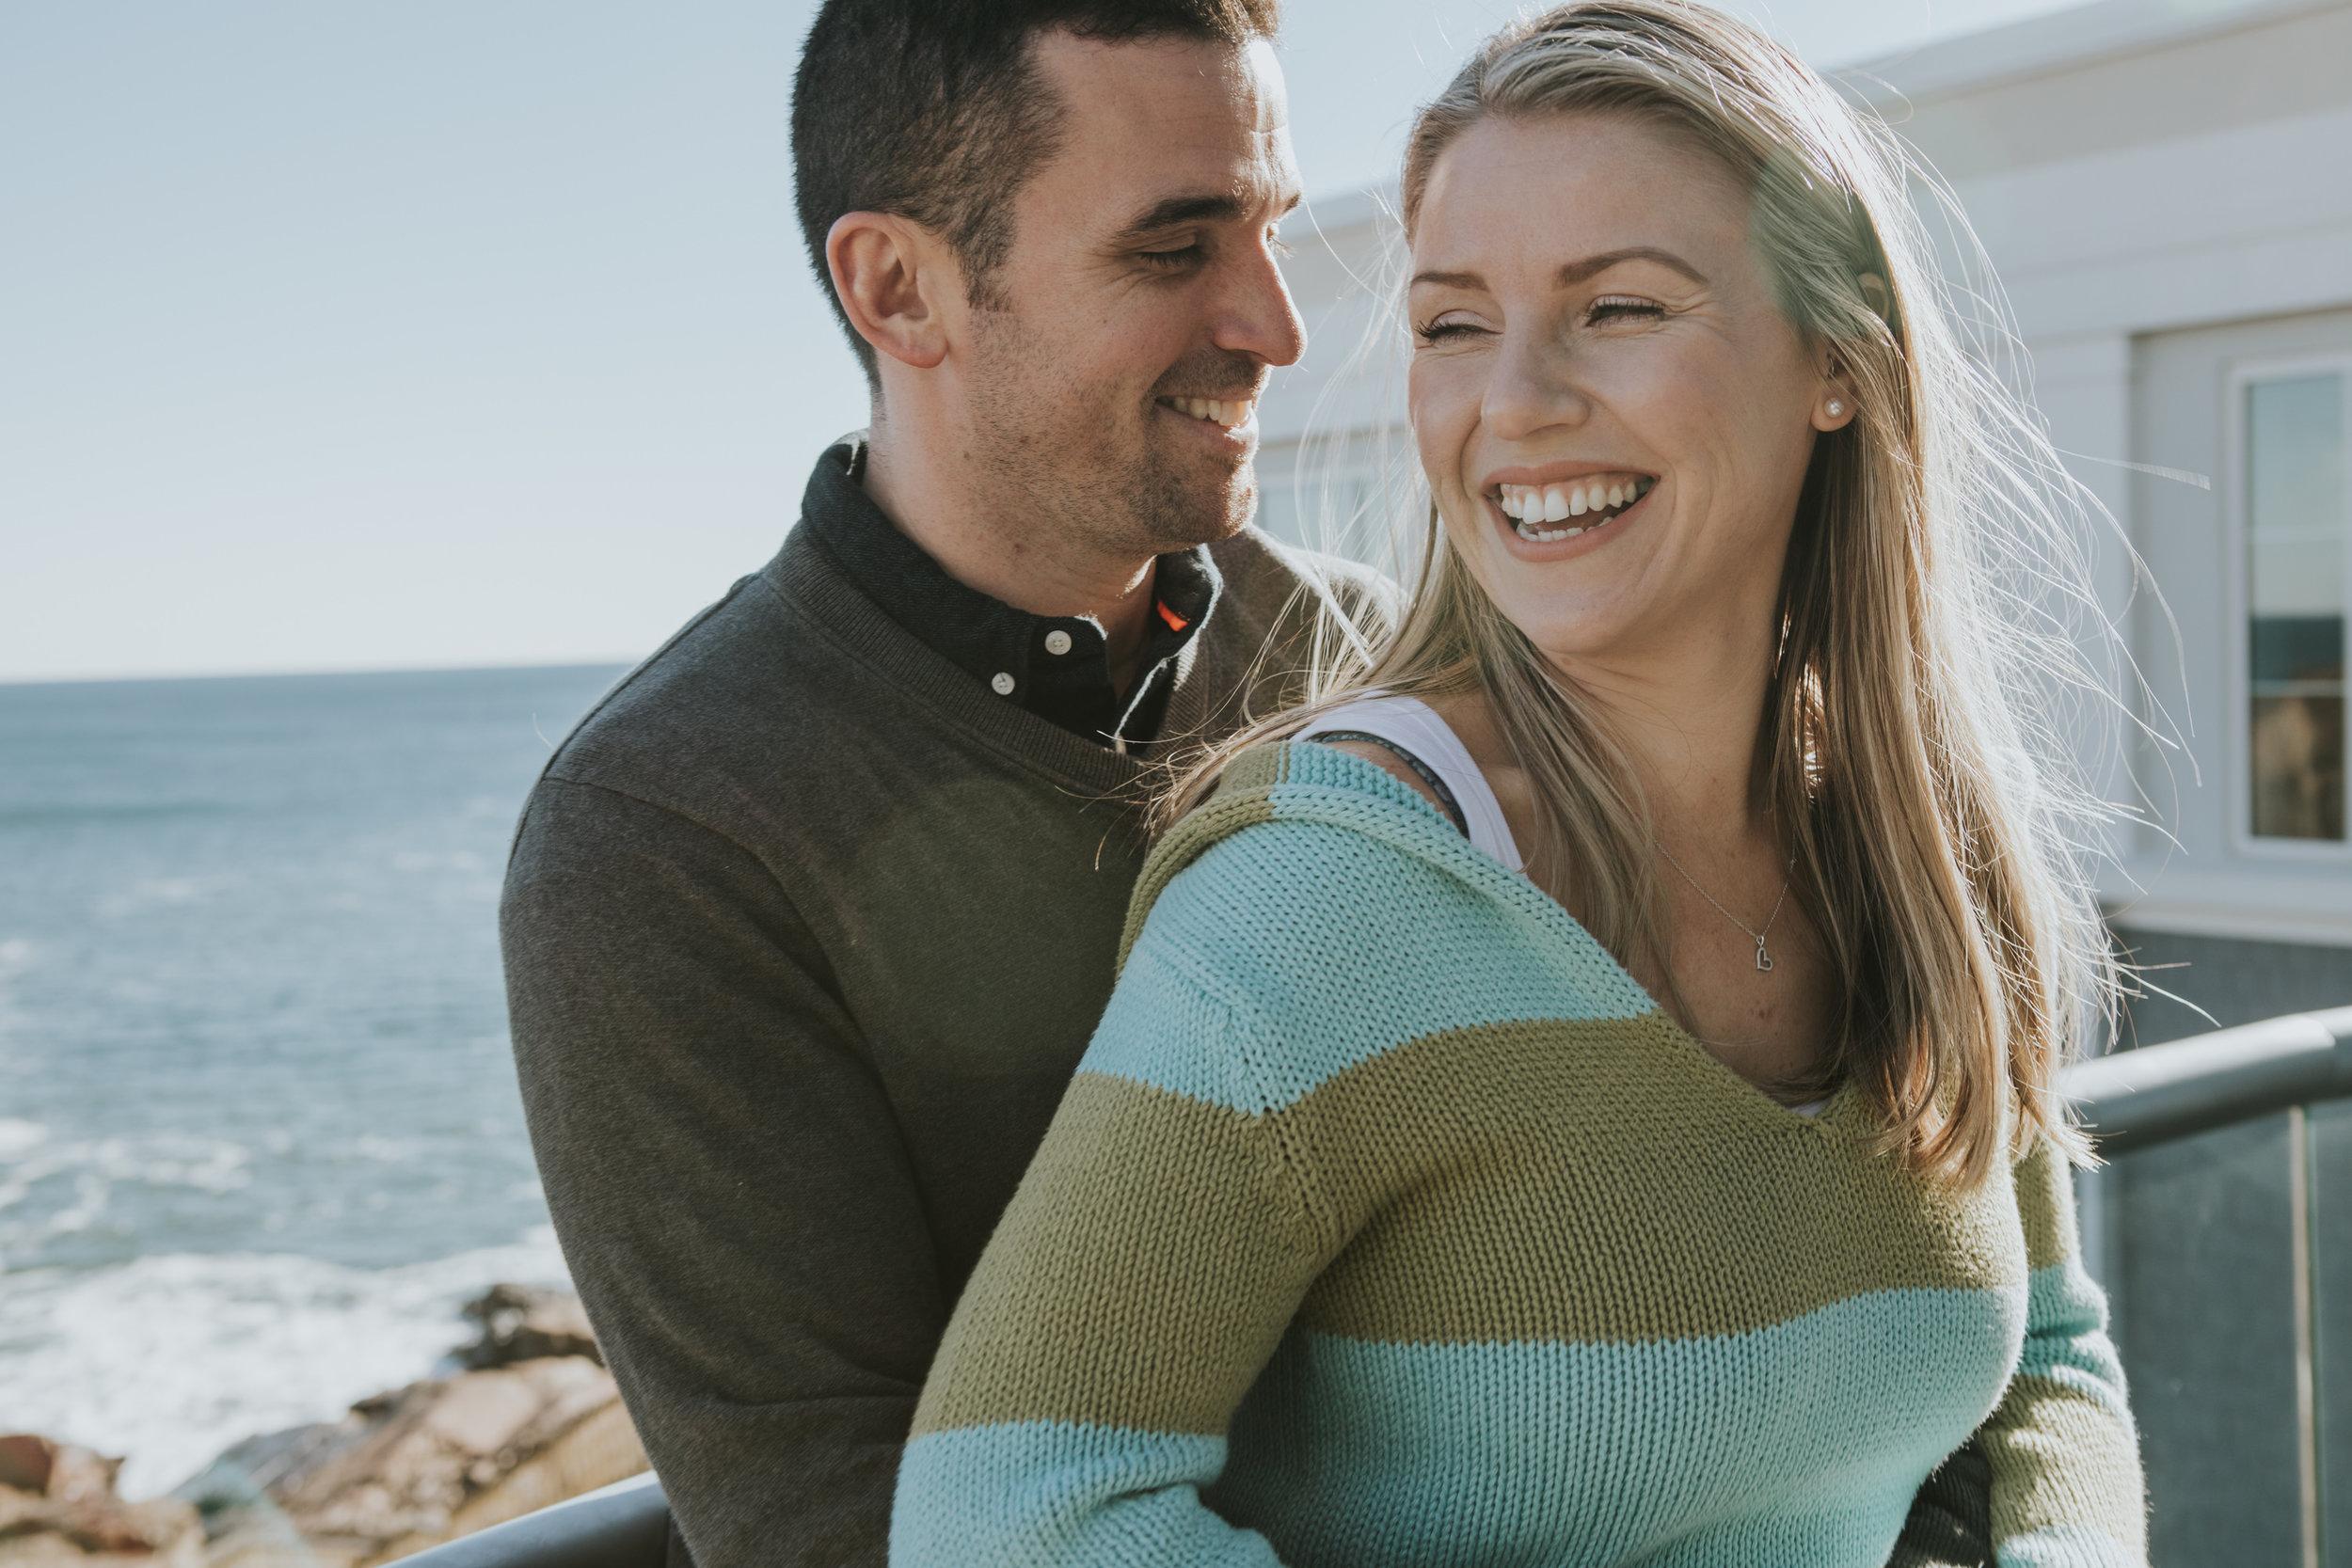 Cliff House Ogunquit Maine Engagement Photos © Heidi Kirn Photography117.jpg